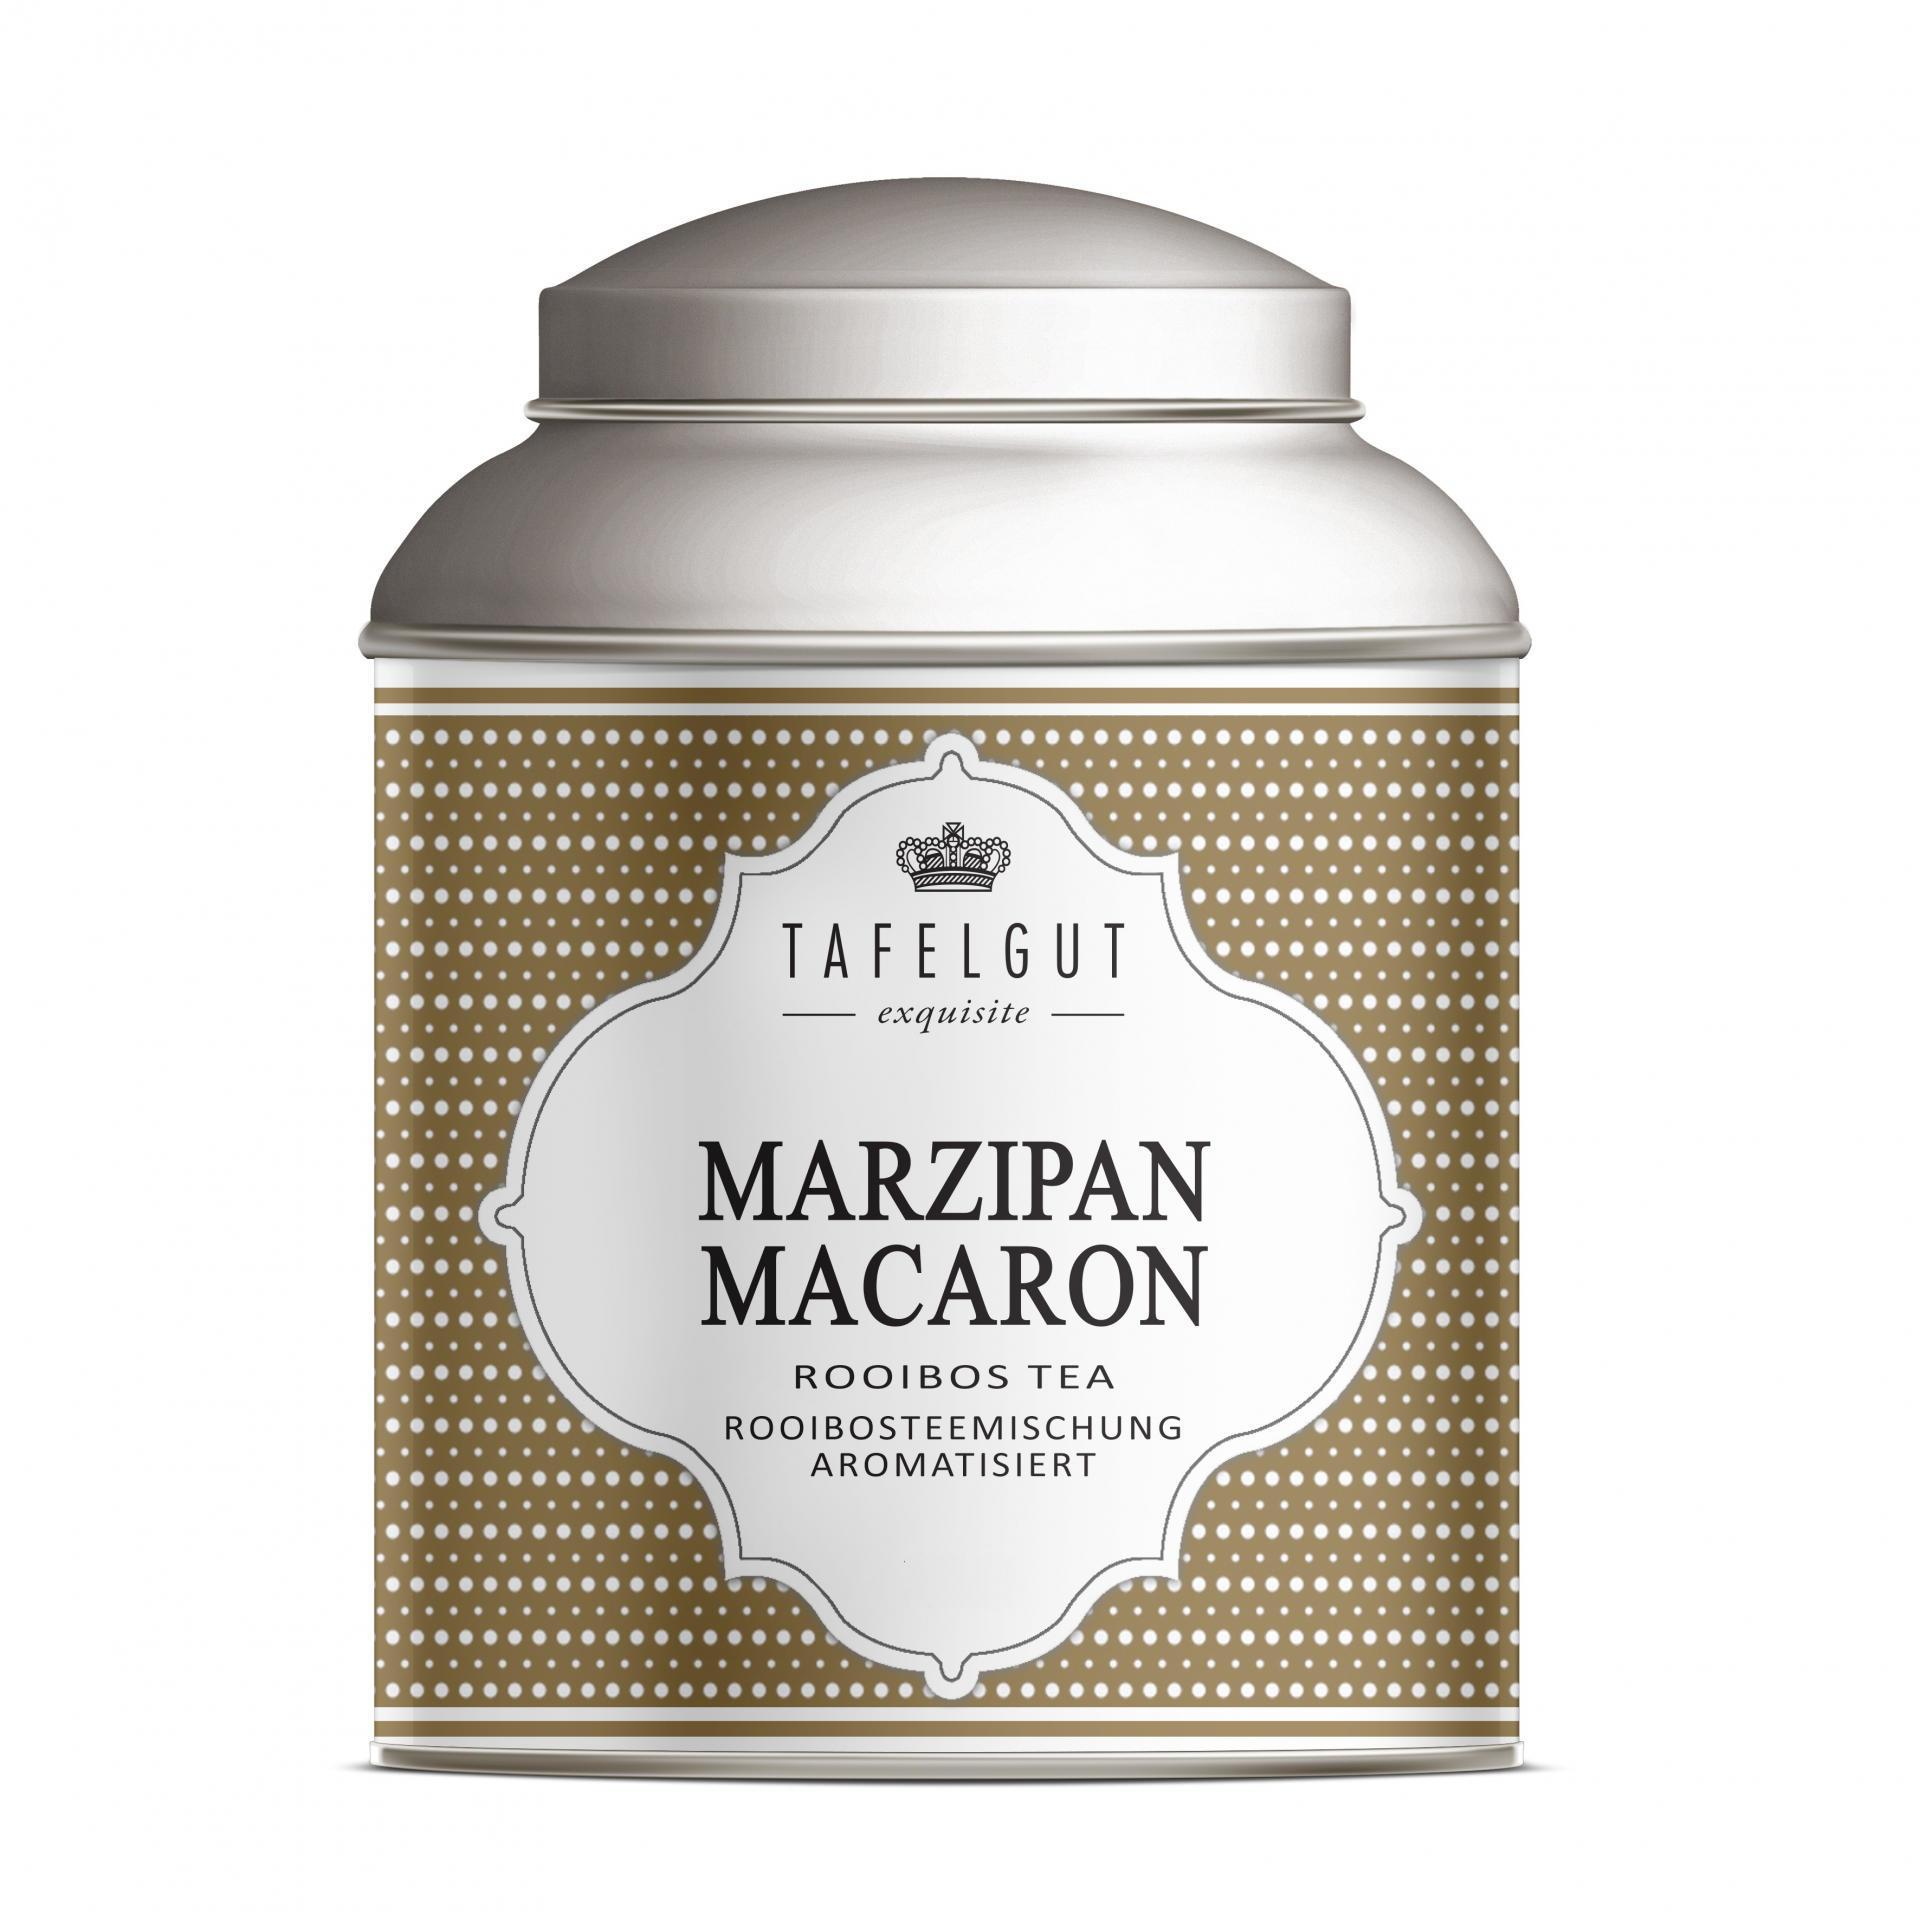 TAFELGUT Mini rooibos čaj Marzipan Macaron - 40gr, měděná barva, kov